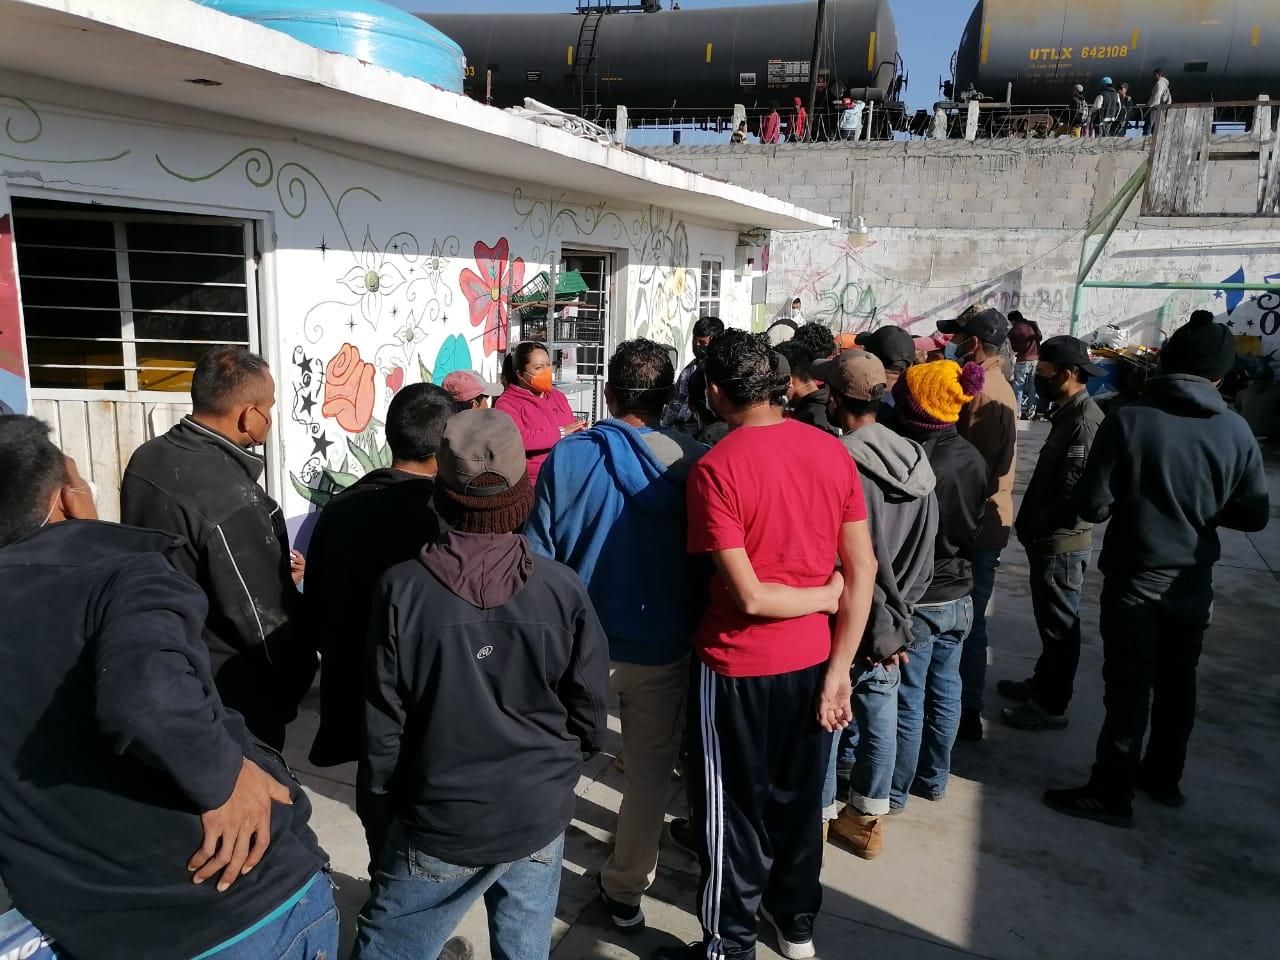 migrantes-Tlaxcala-crisis humanitaria-Apizaco-Crueldad humana